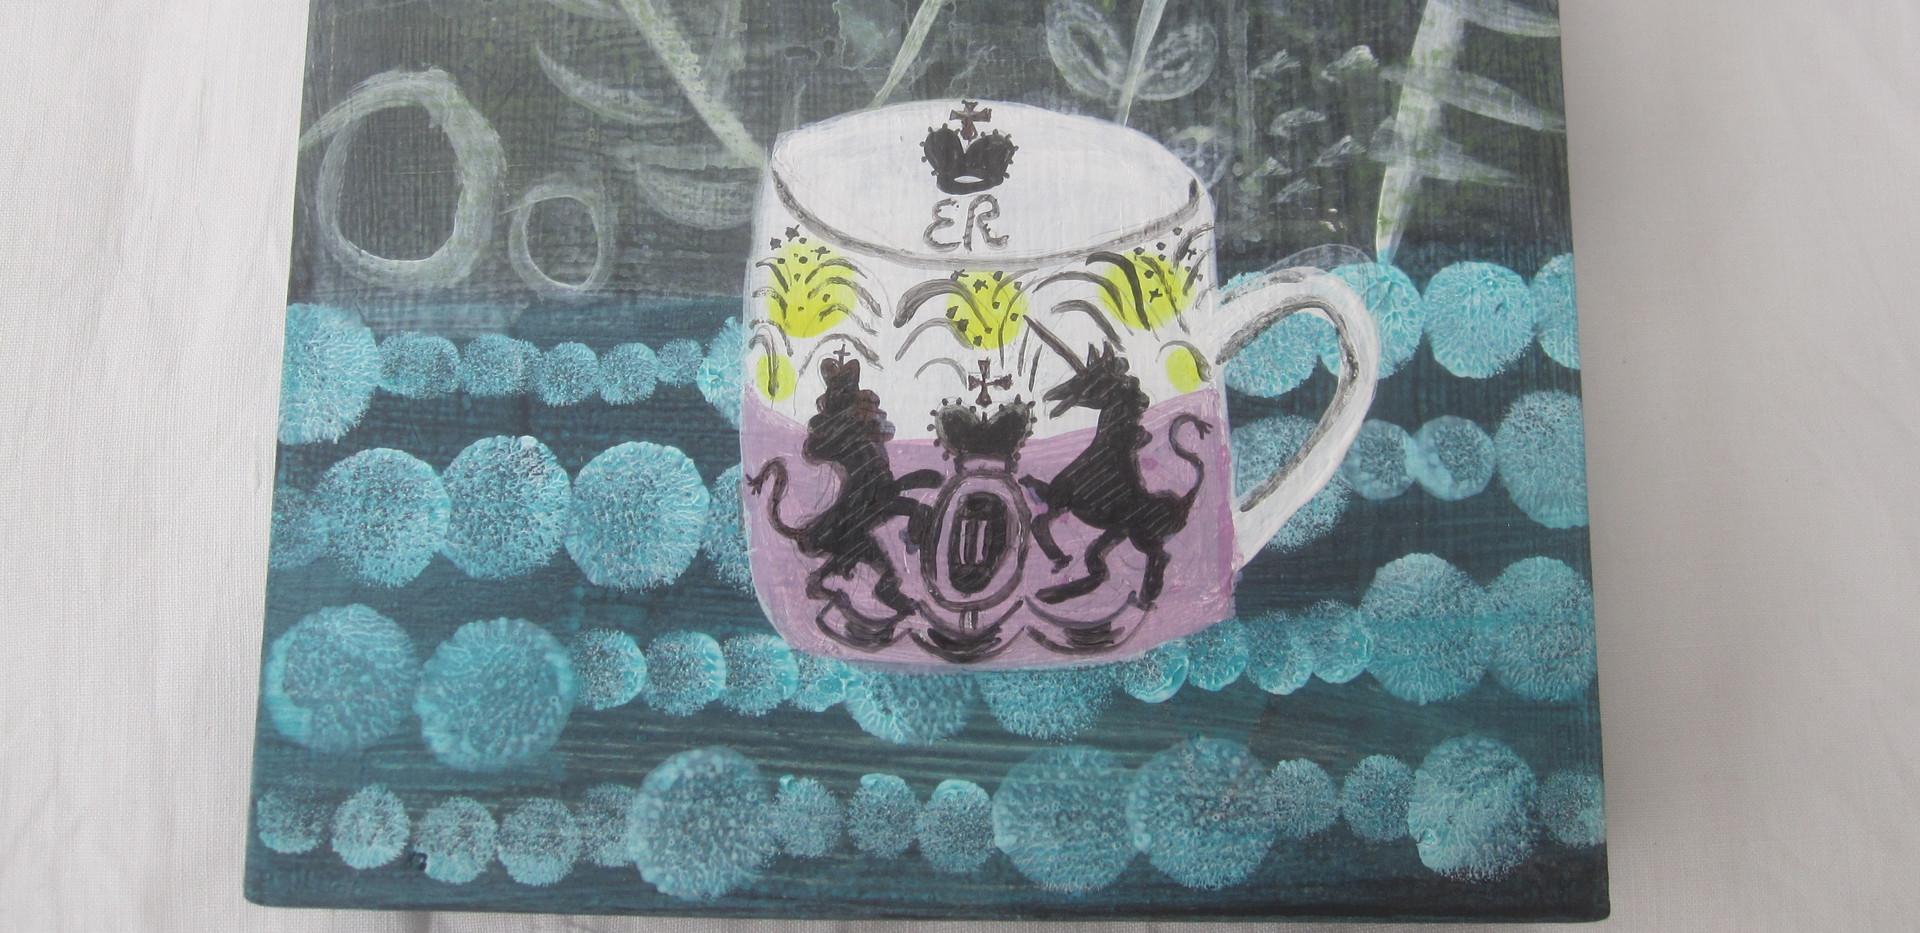 ER Coronation Cup, Mixed Media, Board, 13x13cm.  £50 + p&p.